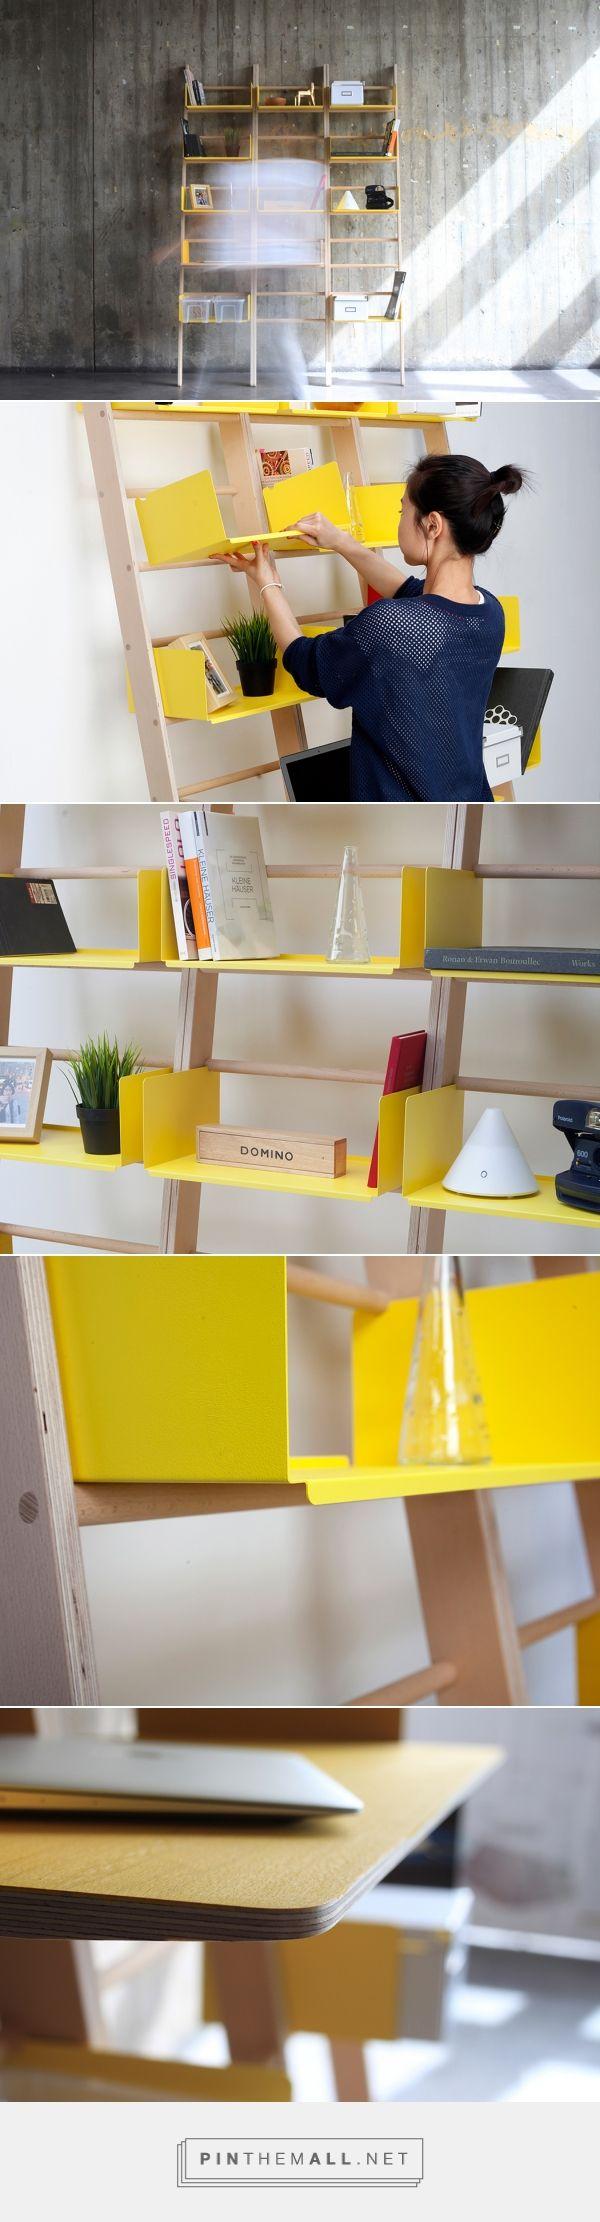 The Mini Modular Library | Yanko Design - created via http://pinthemall.net